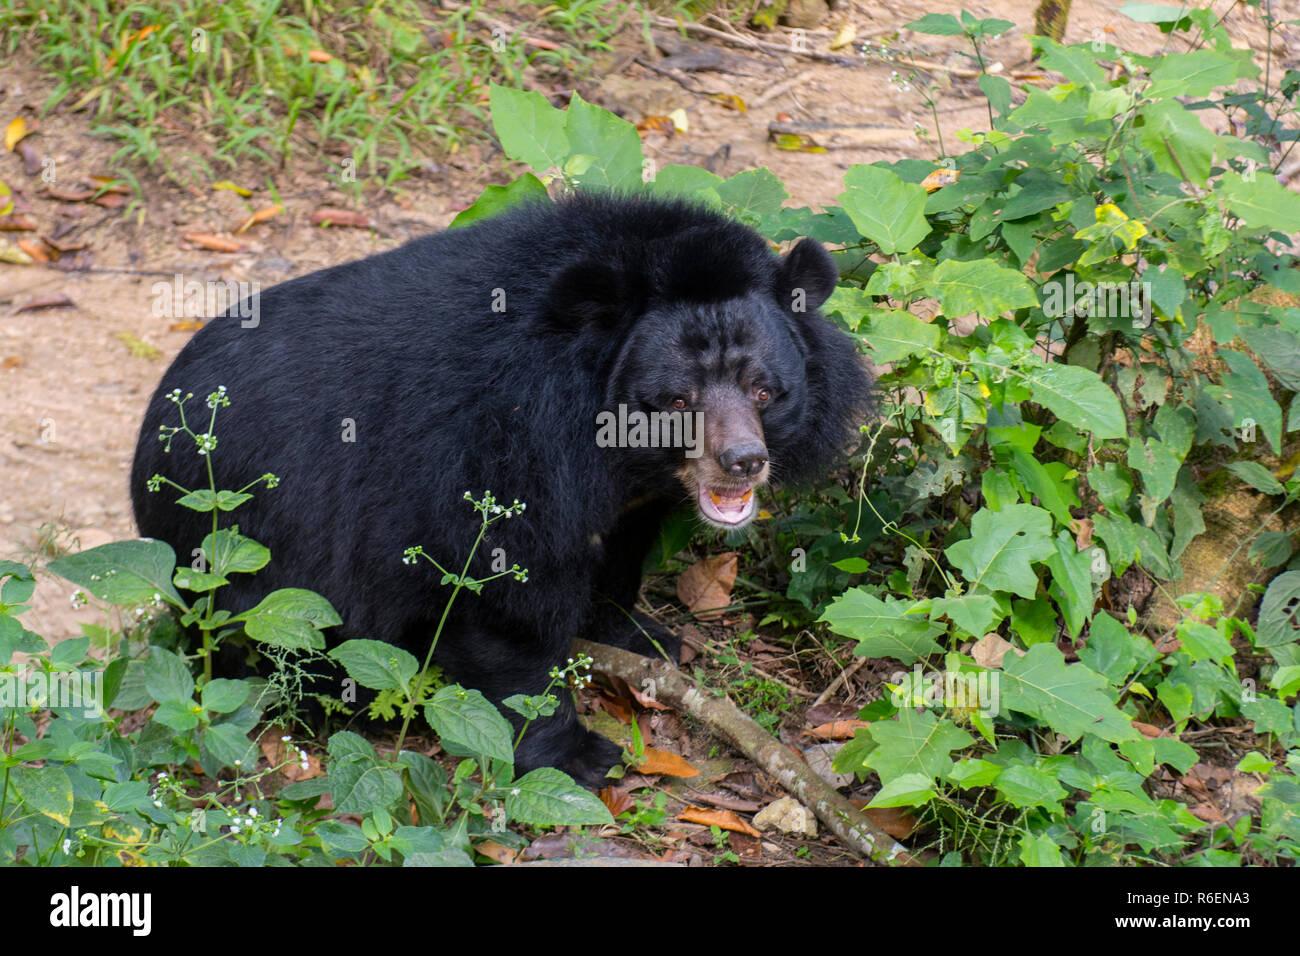 The Asian Black Bear (Ursus Thibetanus, Selenarctos Thibetanus, Moon, Asiatic Black And White-Chested Bear) Near Luang Prabang In Laos, Indochina, Sou - Stock Image